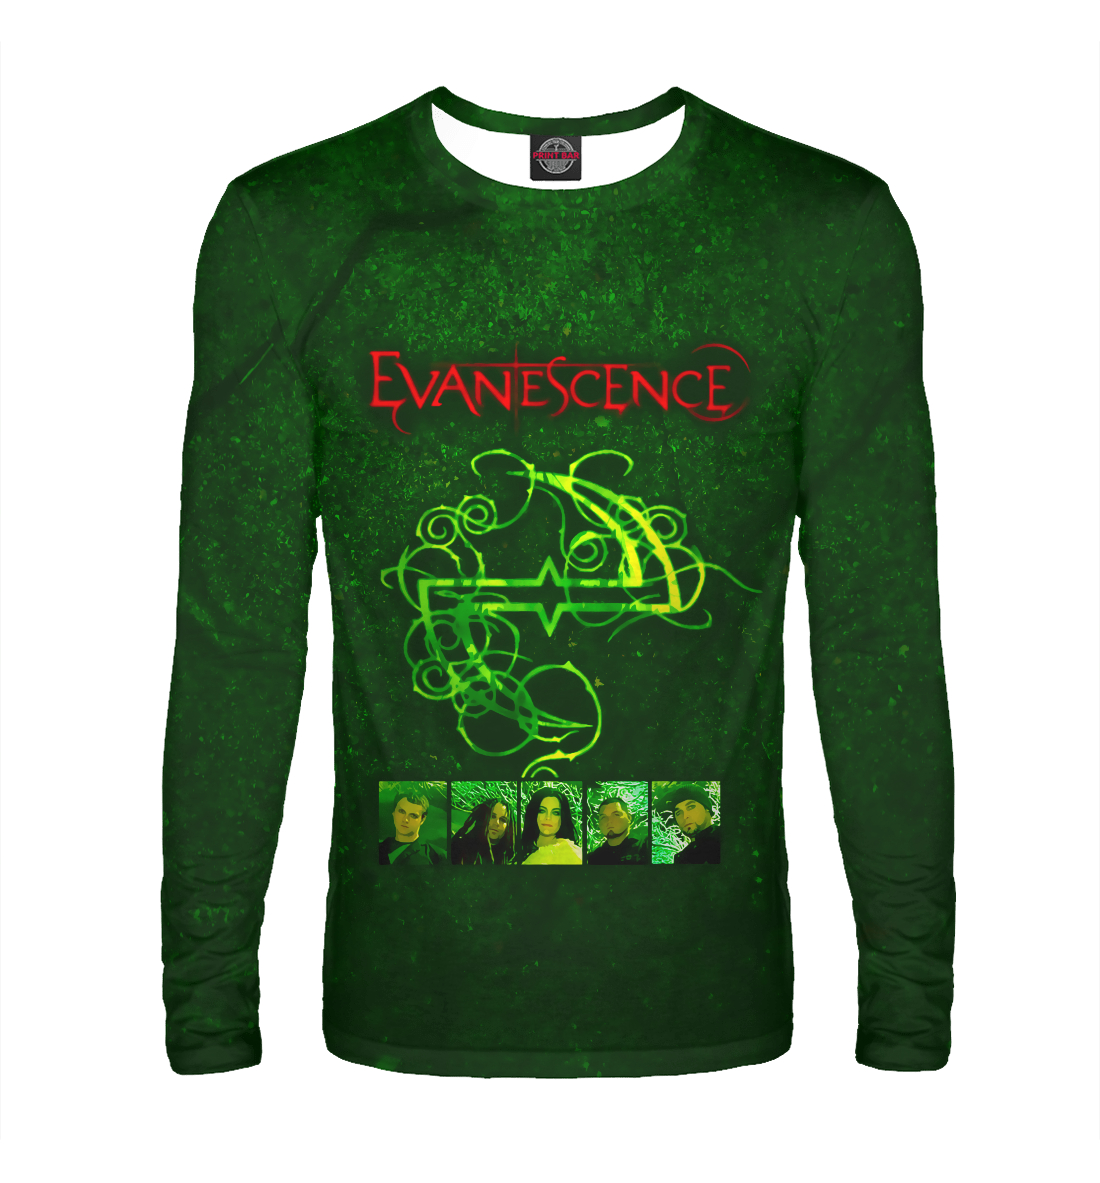 Лонгслив Evanescence (8101)